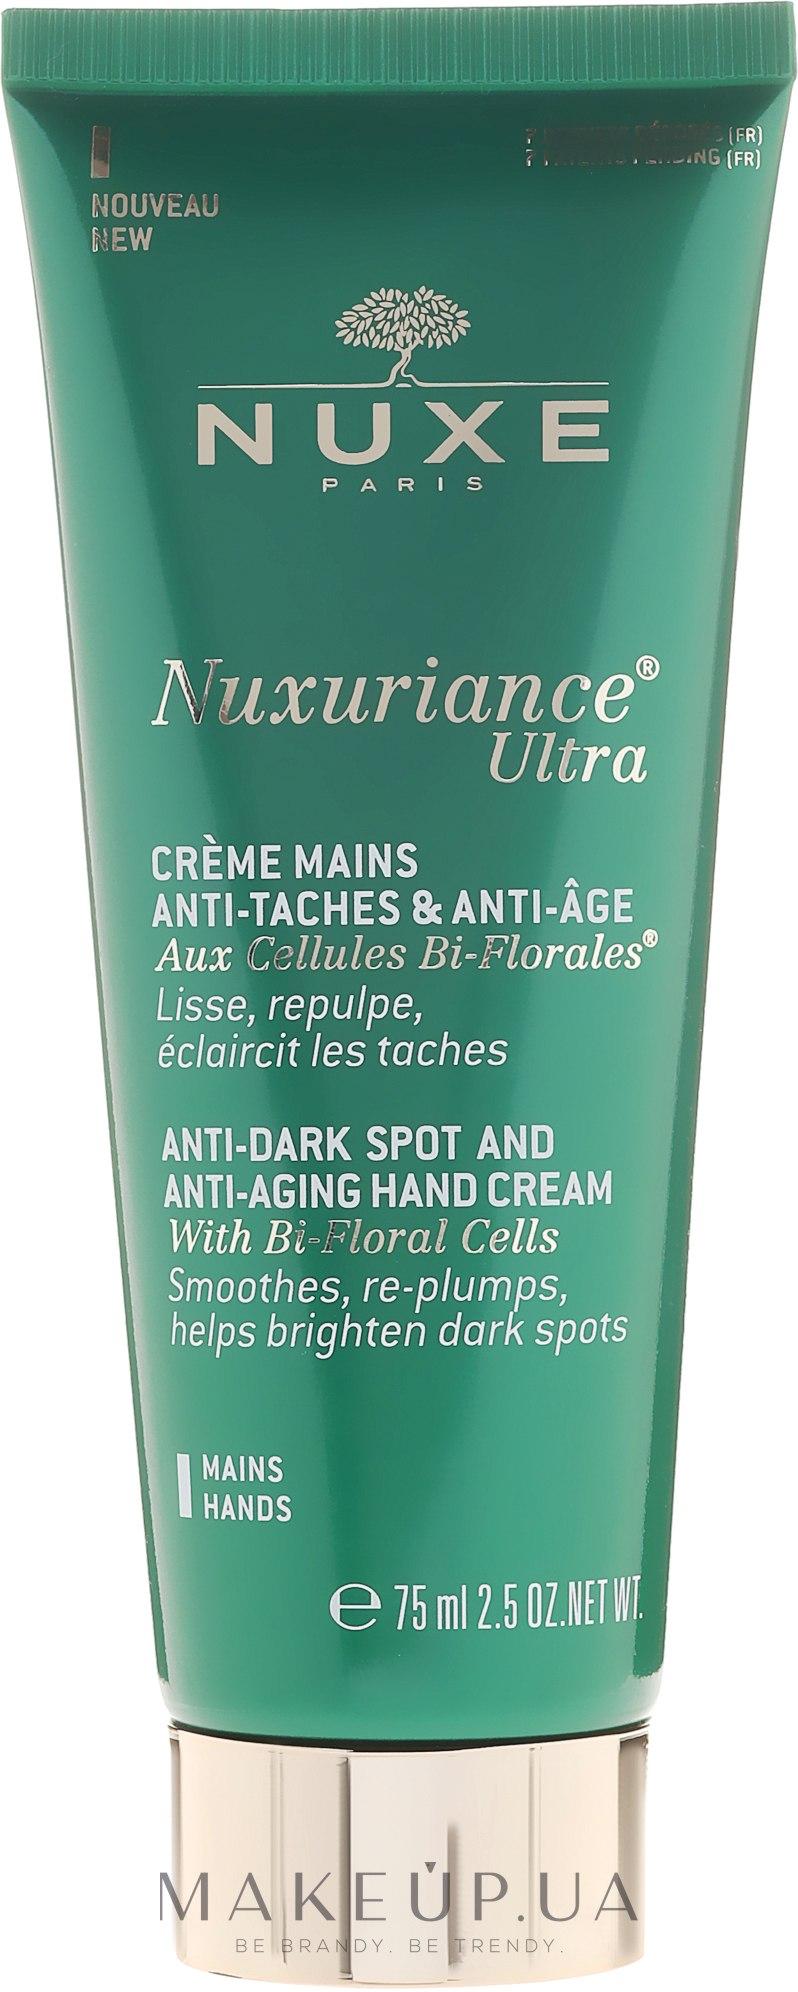 Крем для рук омолаживающий - Nuxe Nuxuriance Ultra Anti-Dark Spot and Anti-Aging Hand Cream — фото 75ml